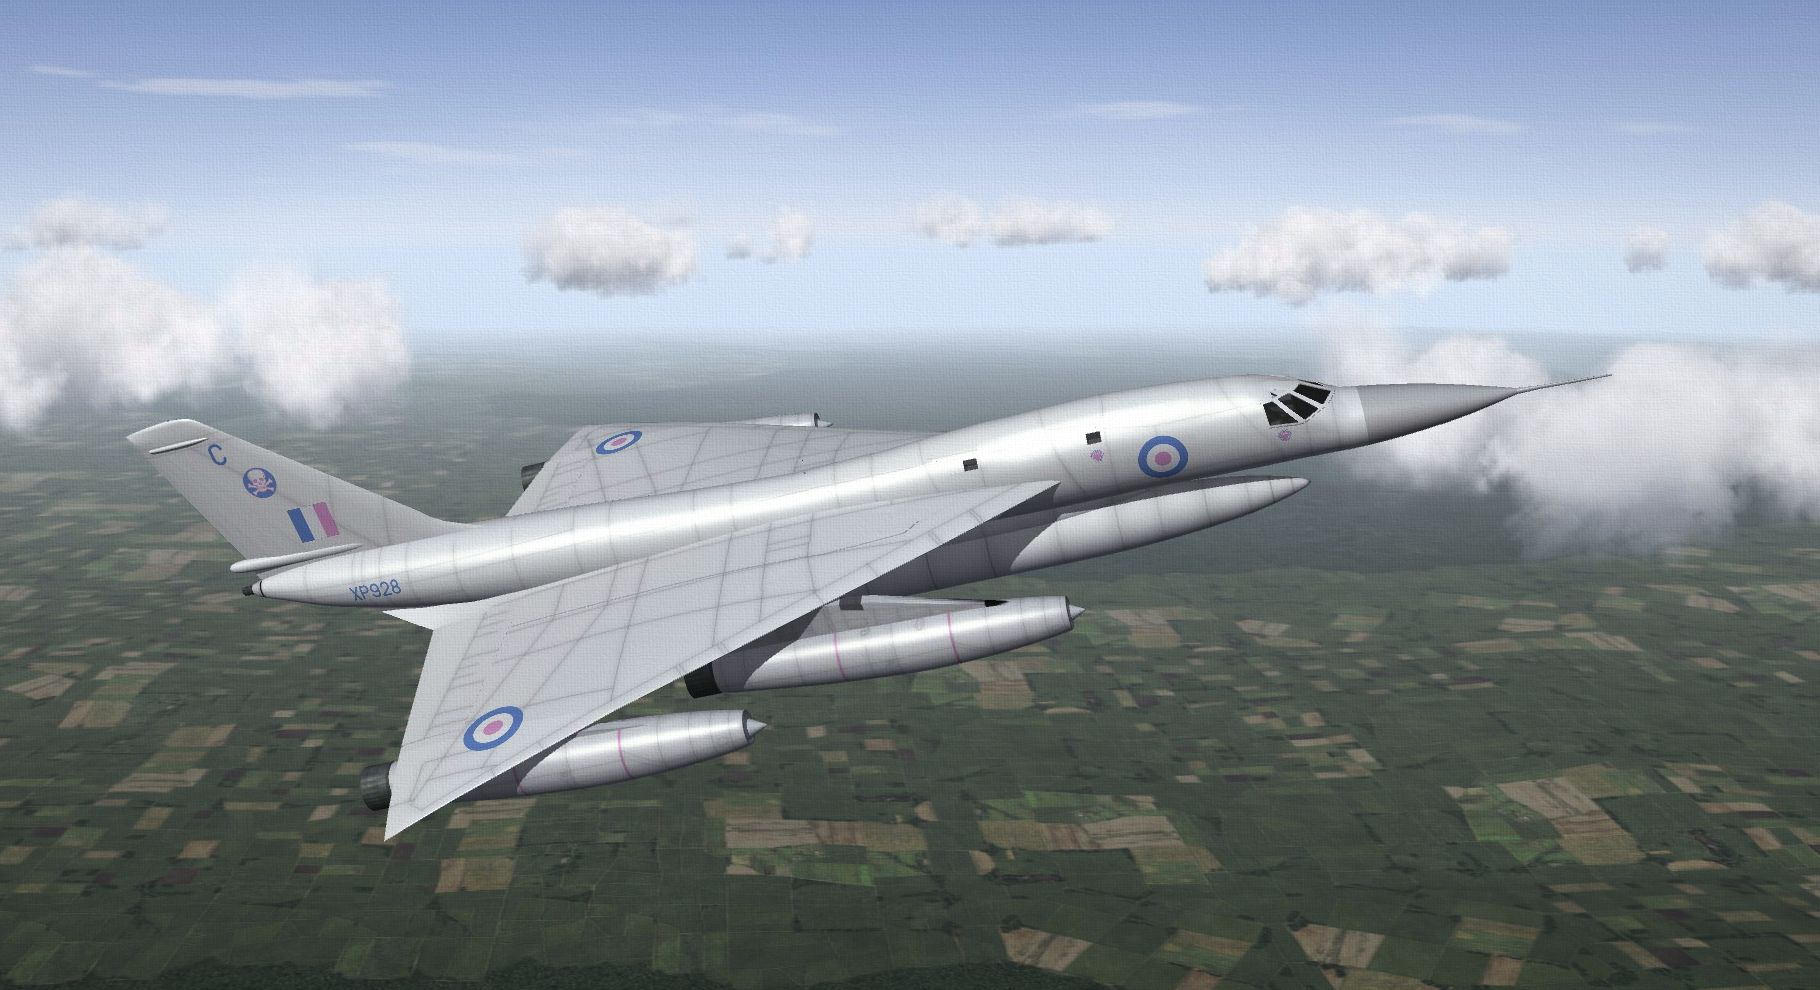 RAF%20HUSTLER%20B1.04_zpsm0qryowm.jpg